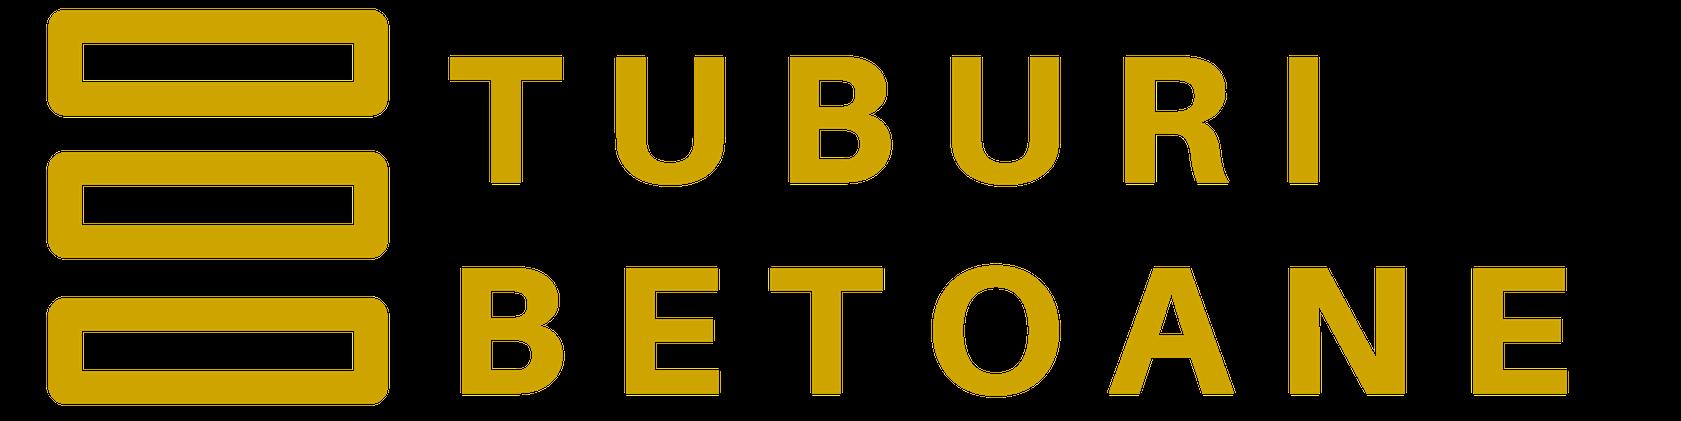 Tuburi Betoane SRL-D